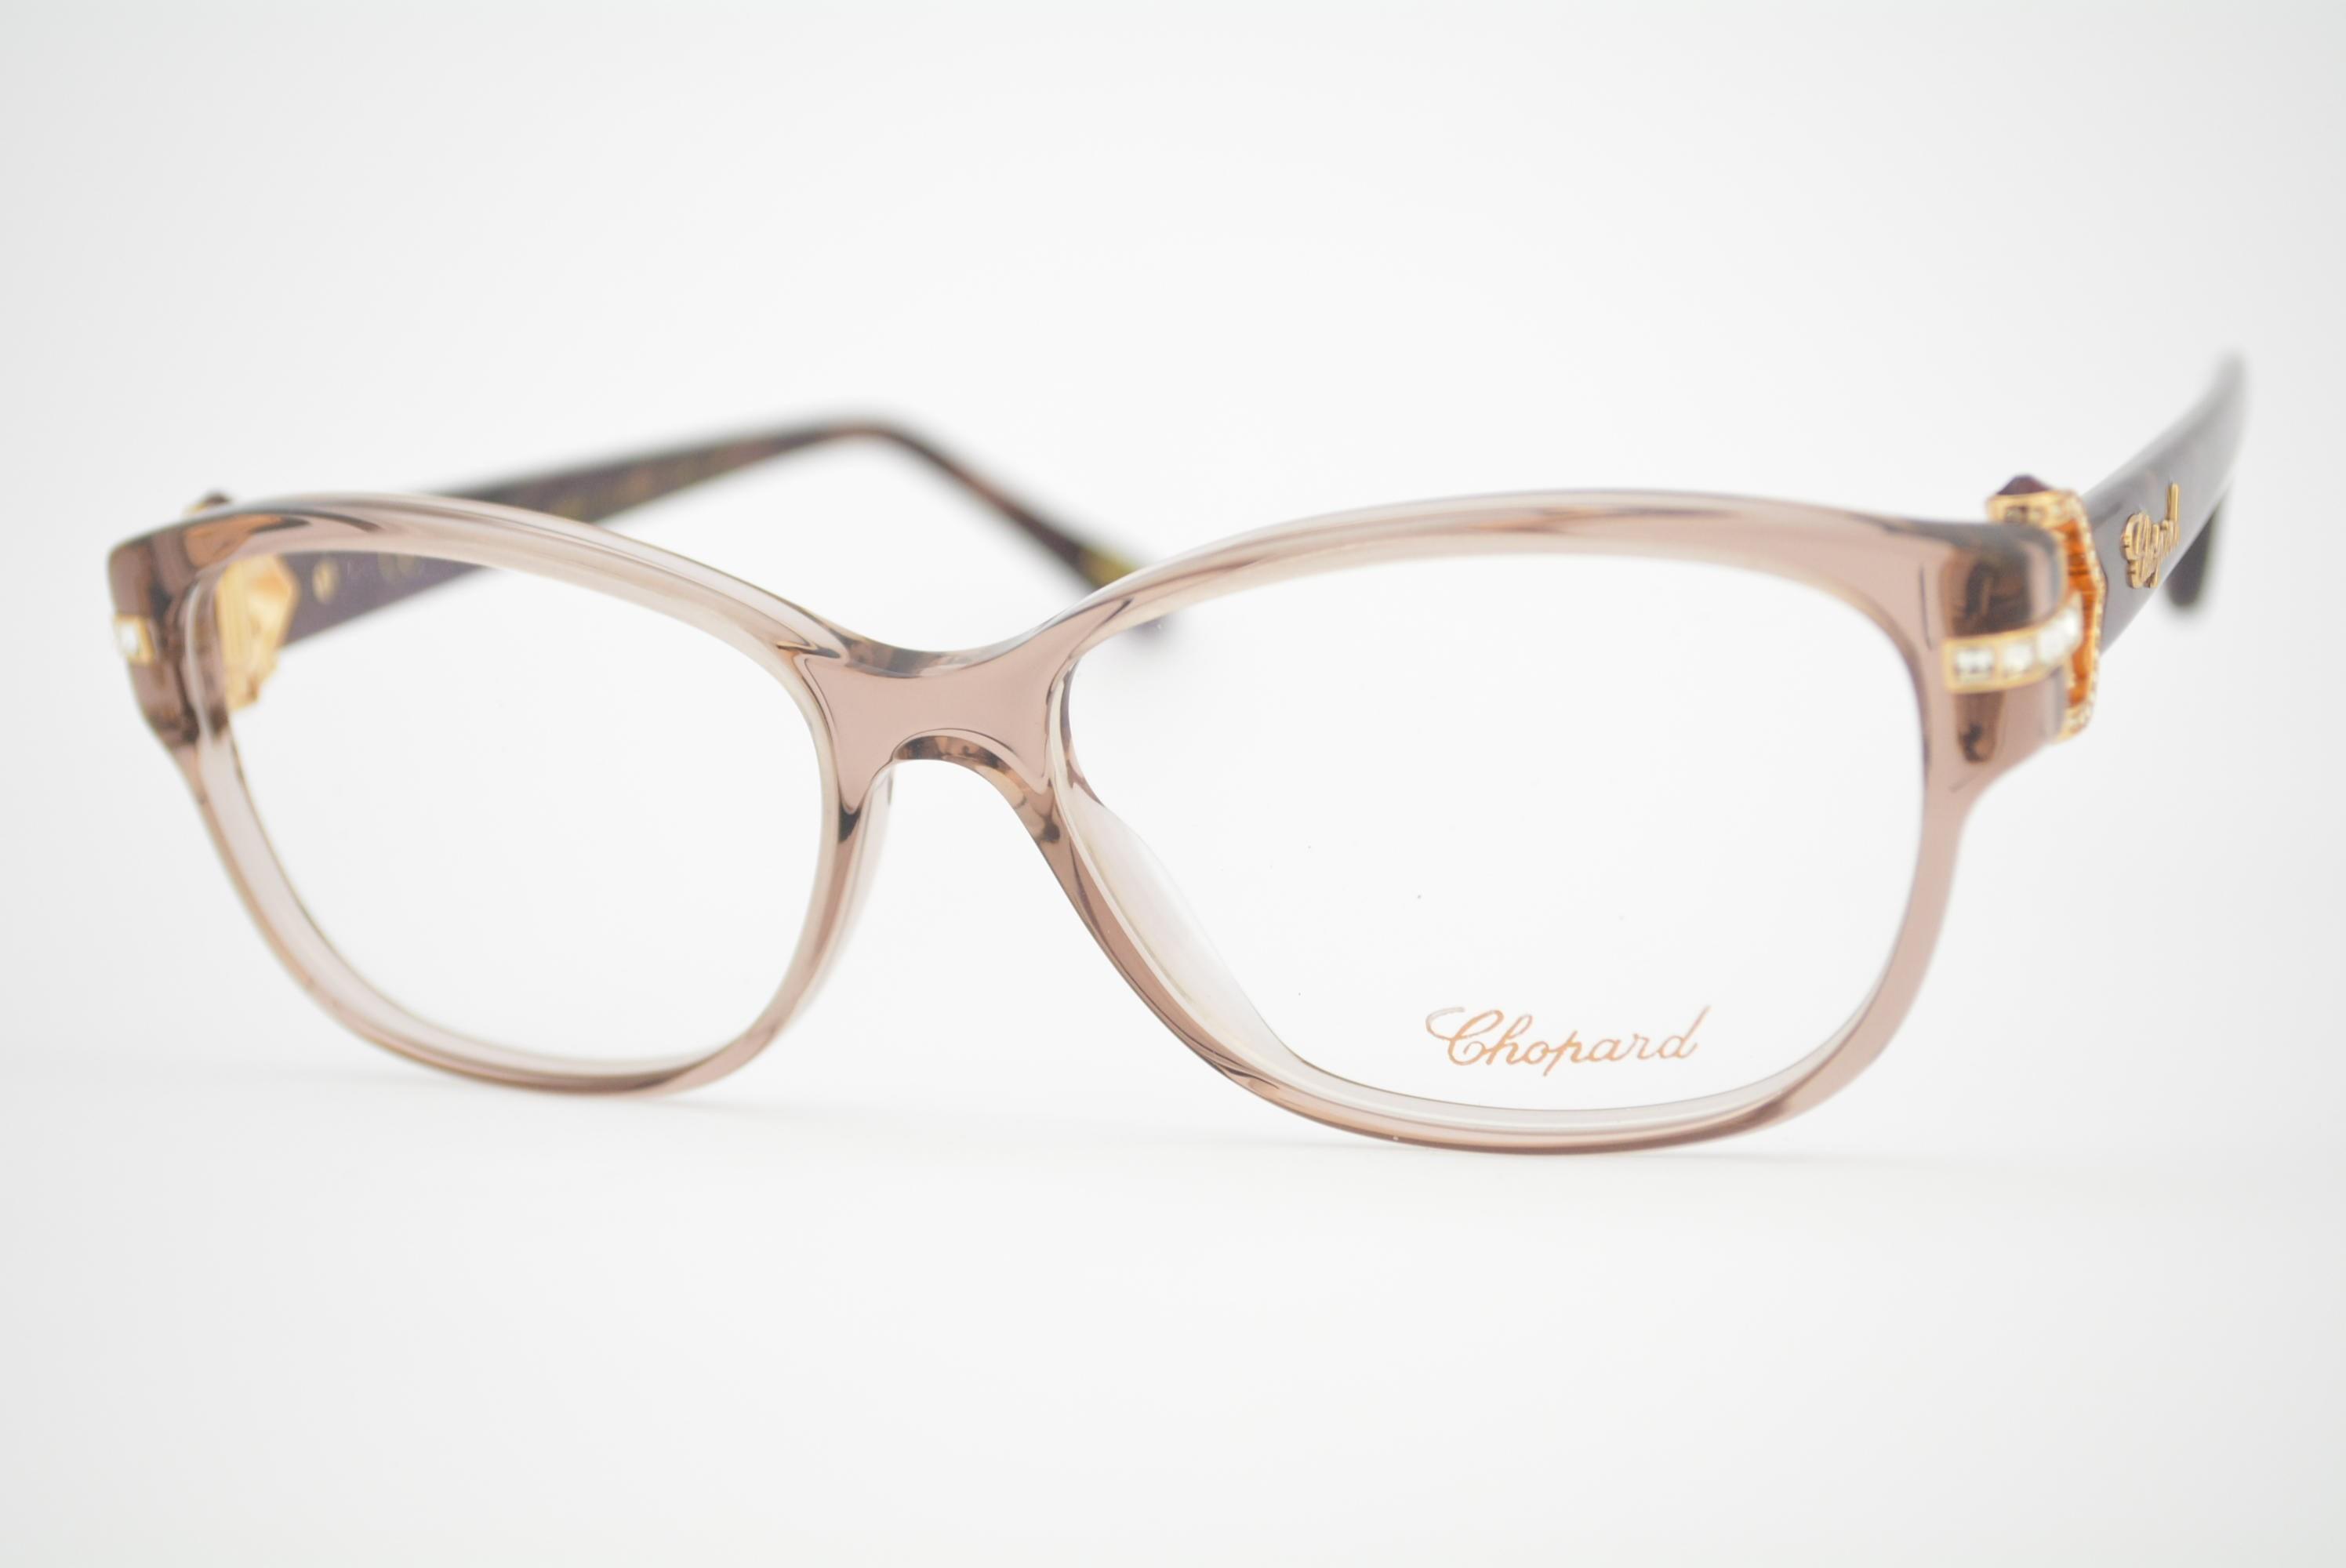 armação de óculos Chopard mod vch228s 0856